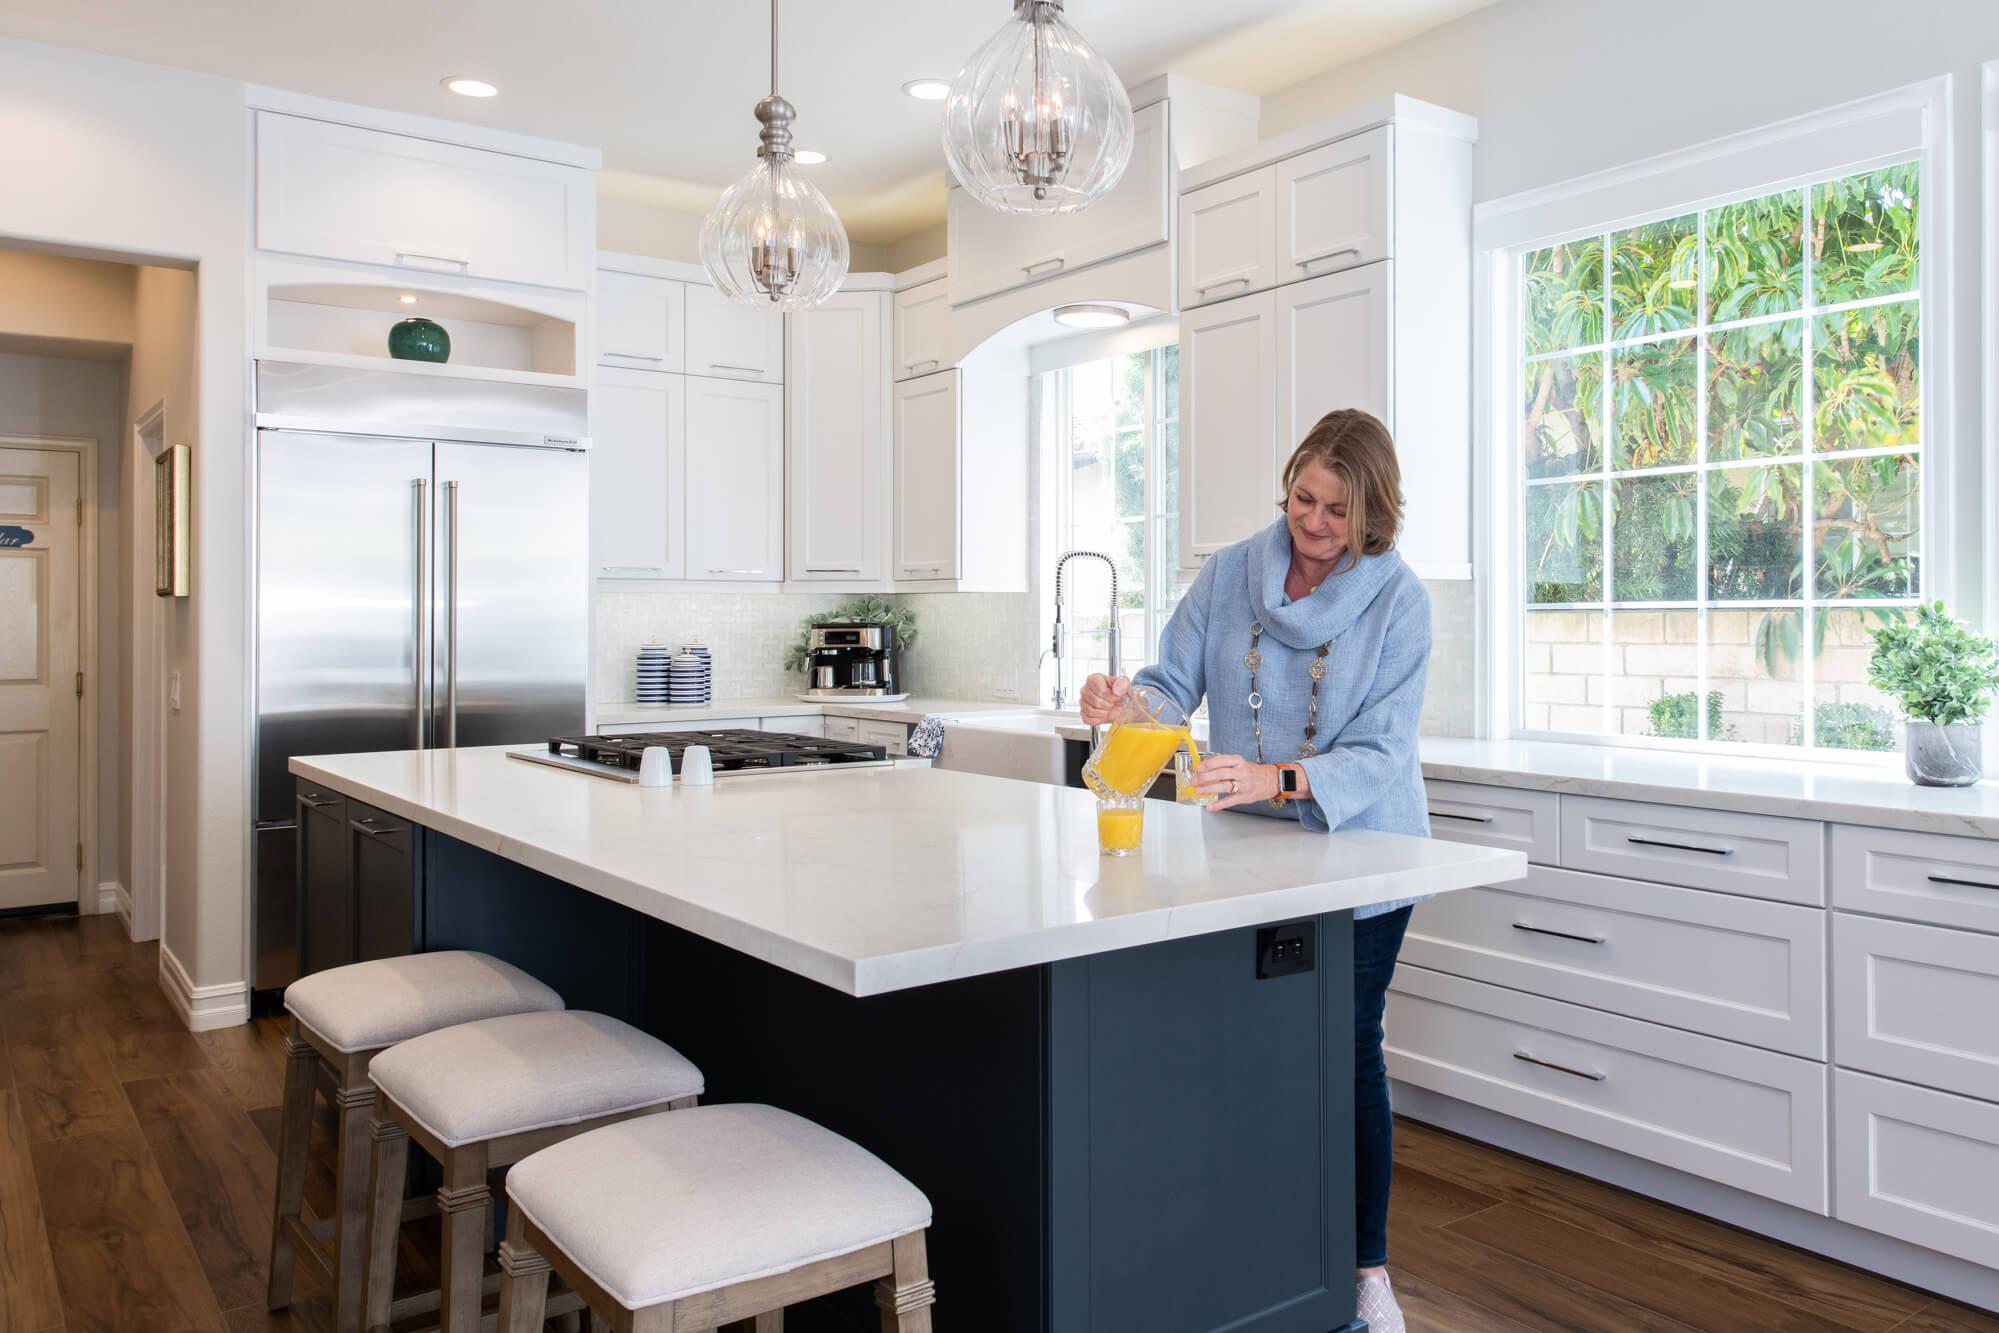 kitchen-island-used-as-breakfast-bar